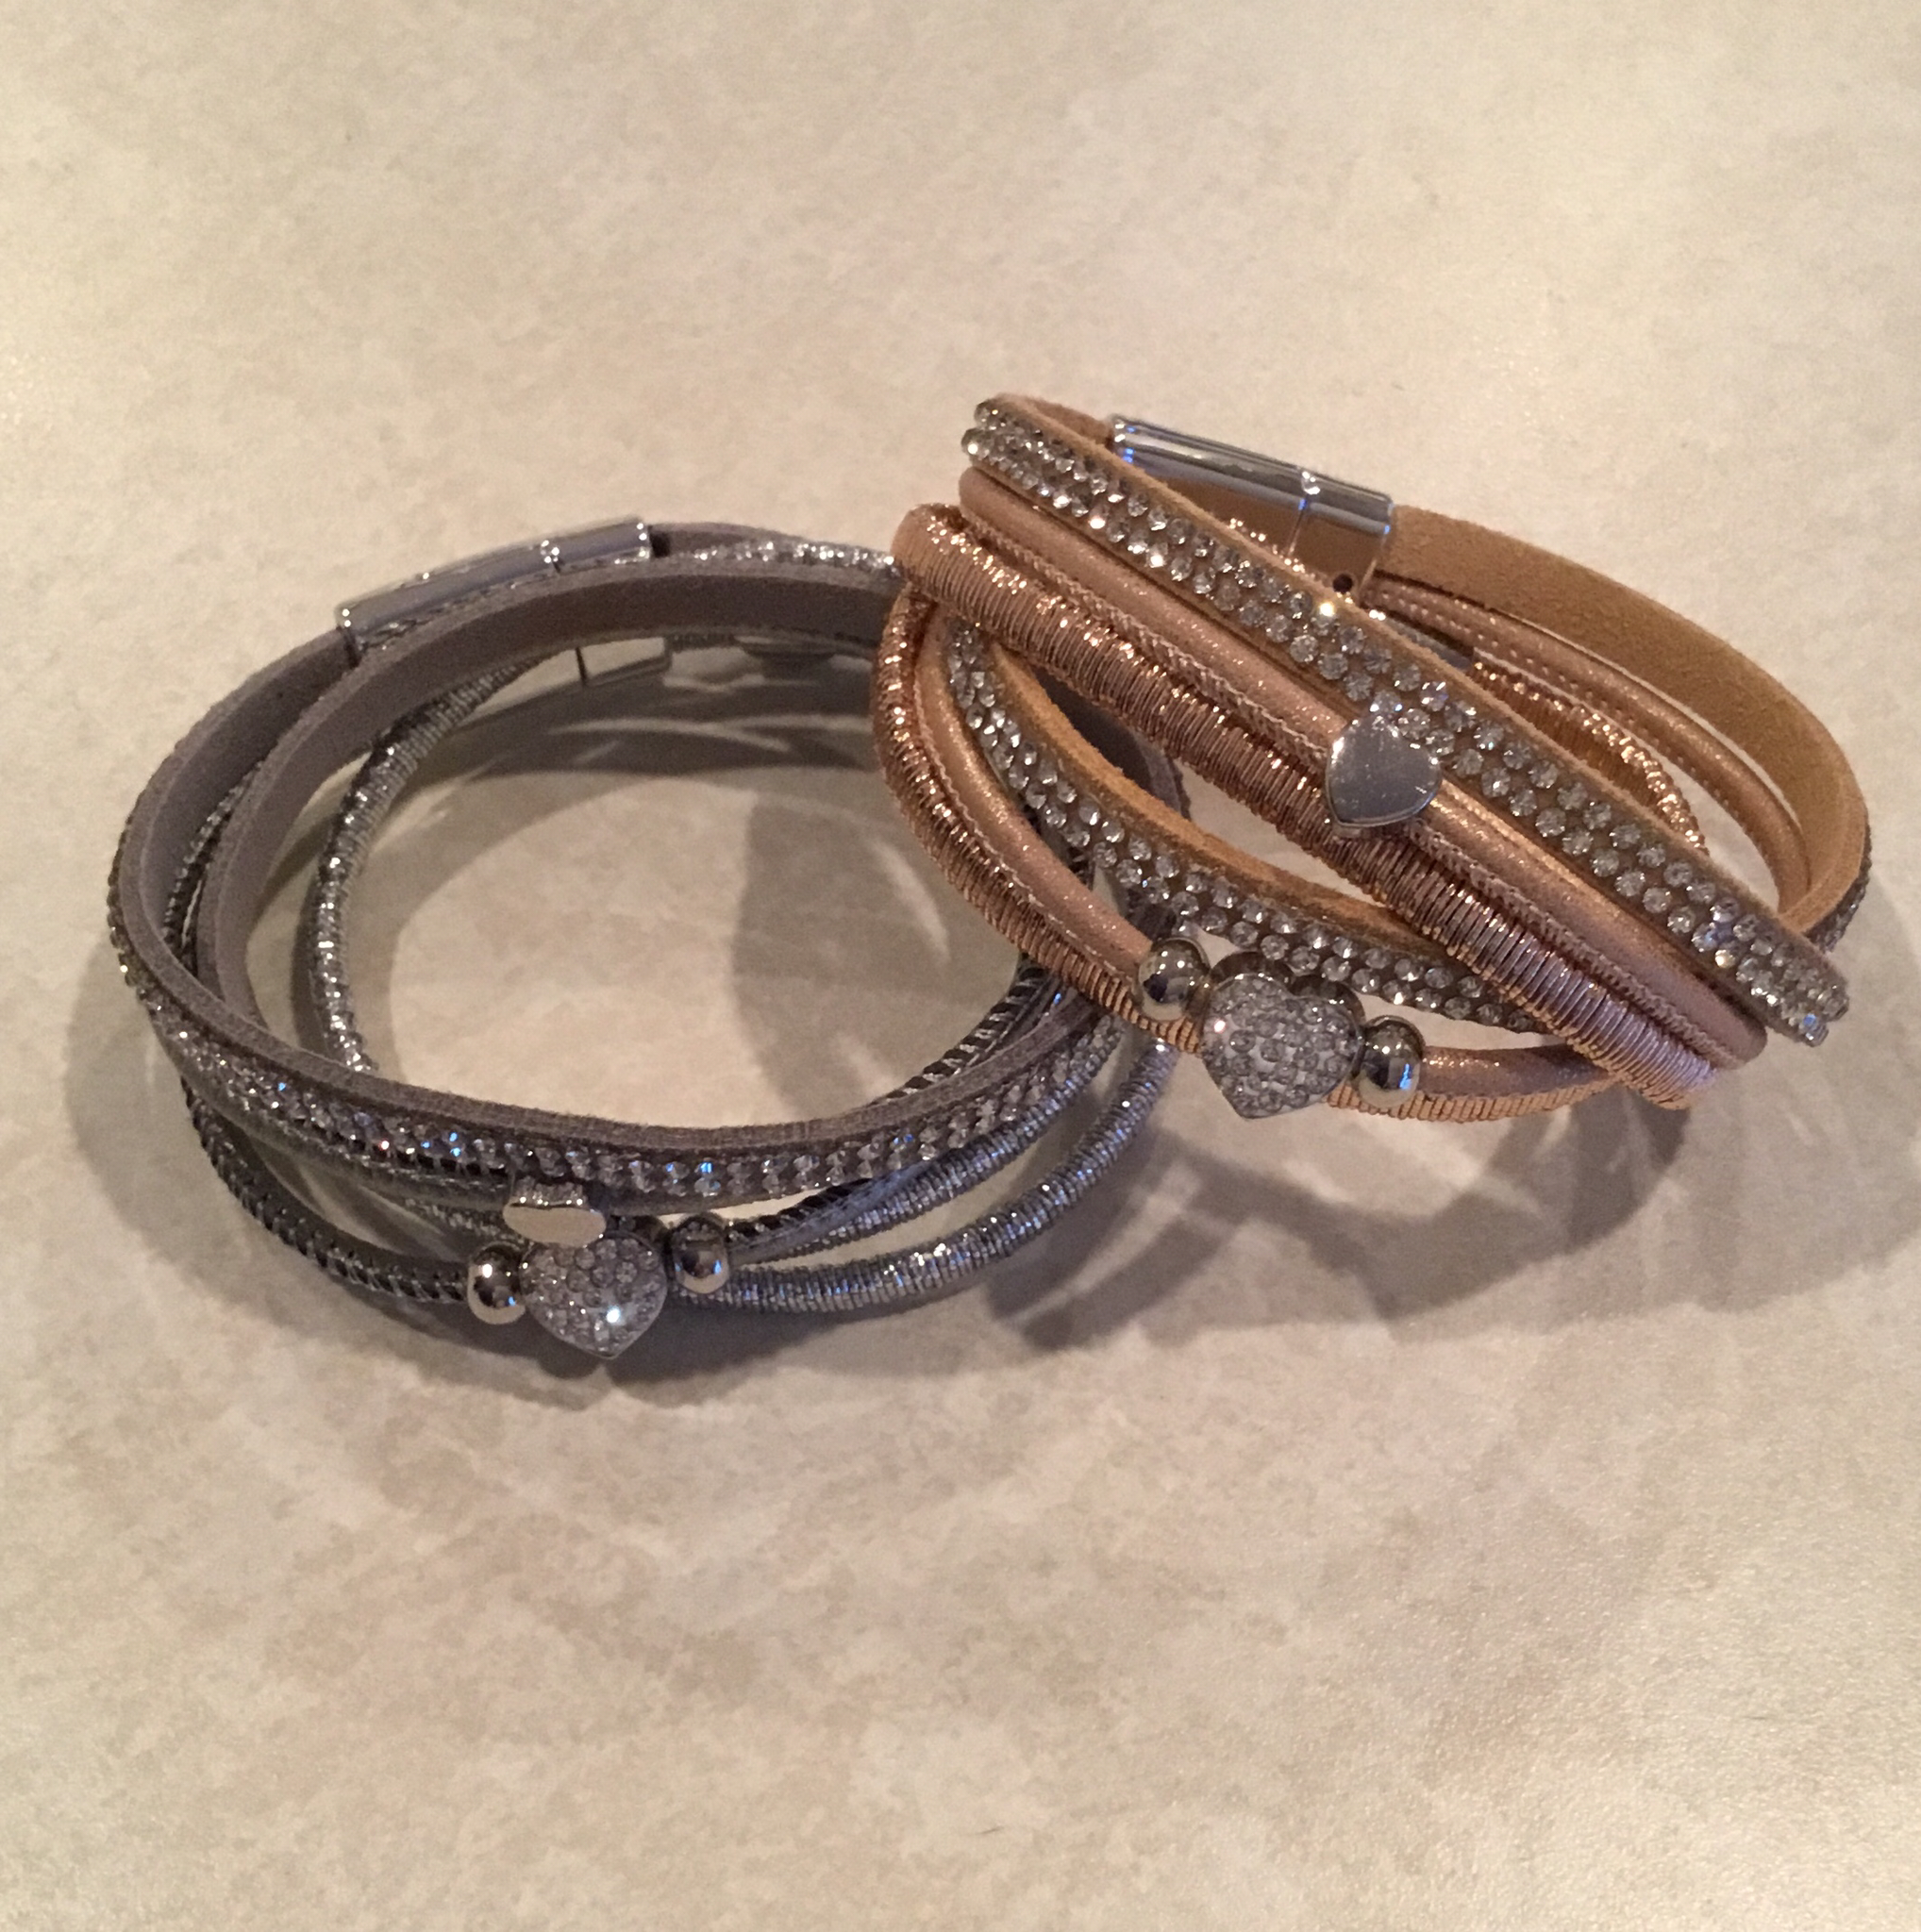 Leather Wrap Bracelet With Heart Bling in Dark Gray or Tan. JBR-026-6925